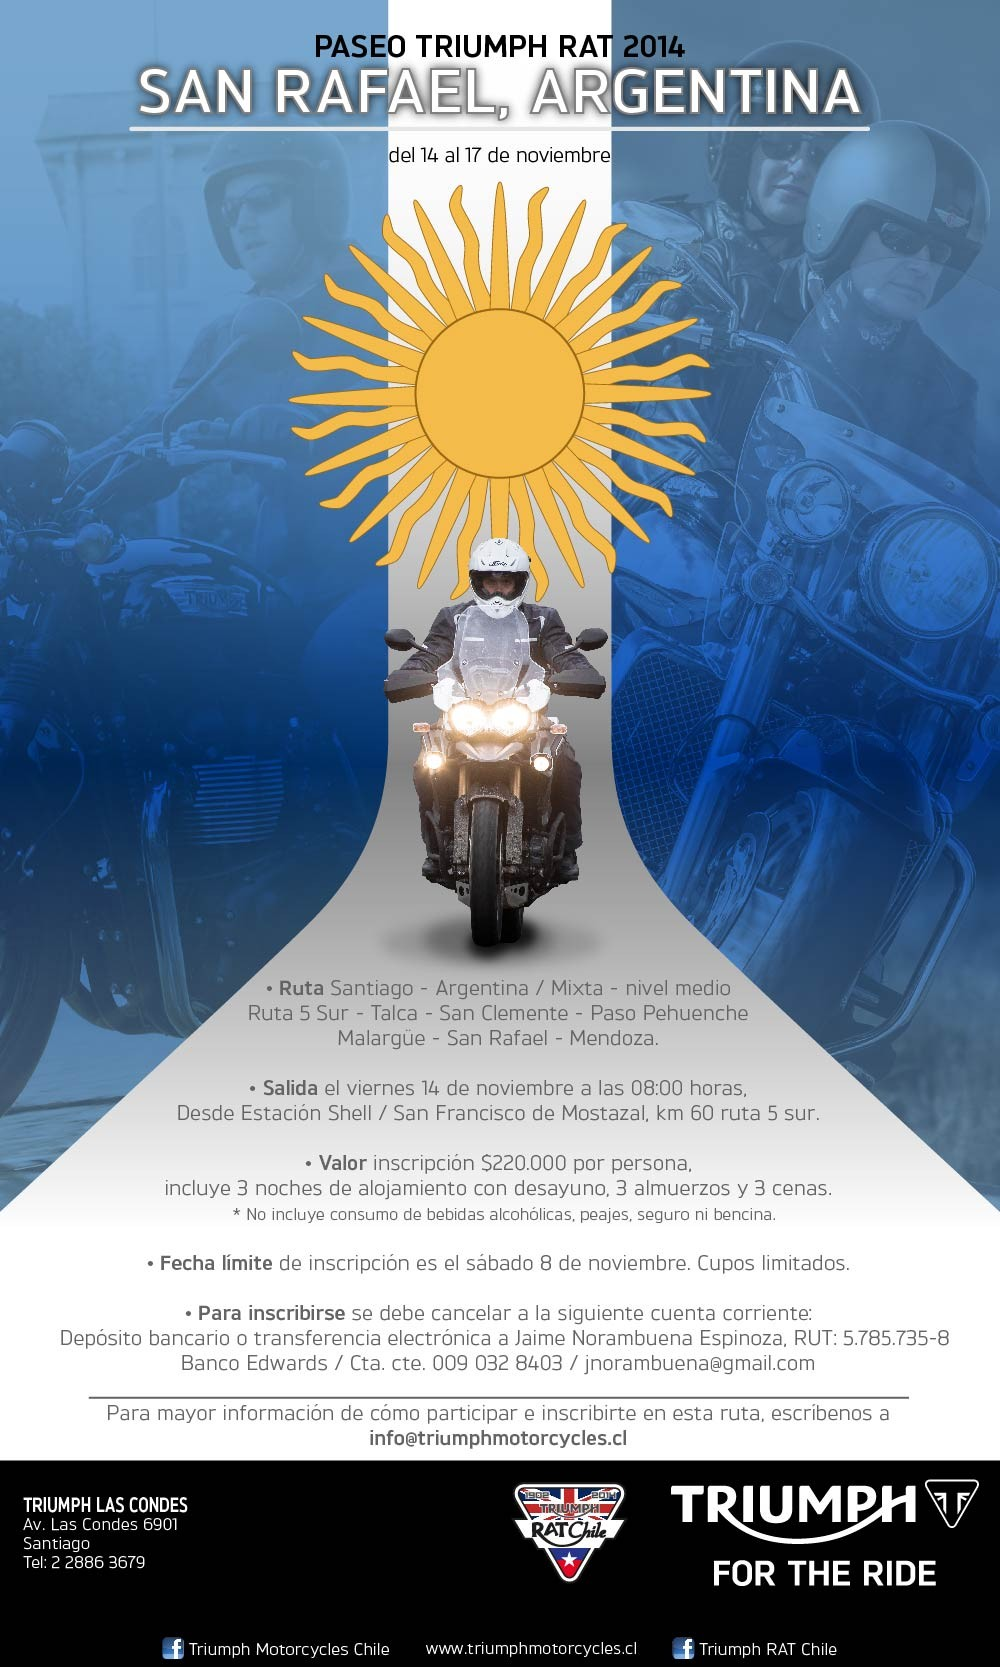 Paseo Triumph RAT Chile / San Rafael-Argentina 2014